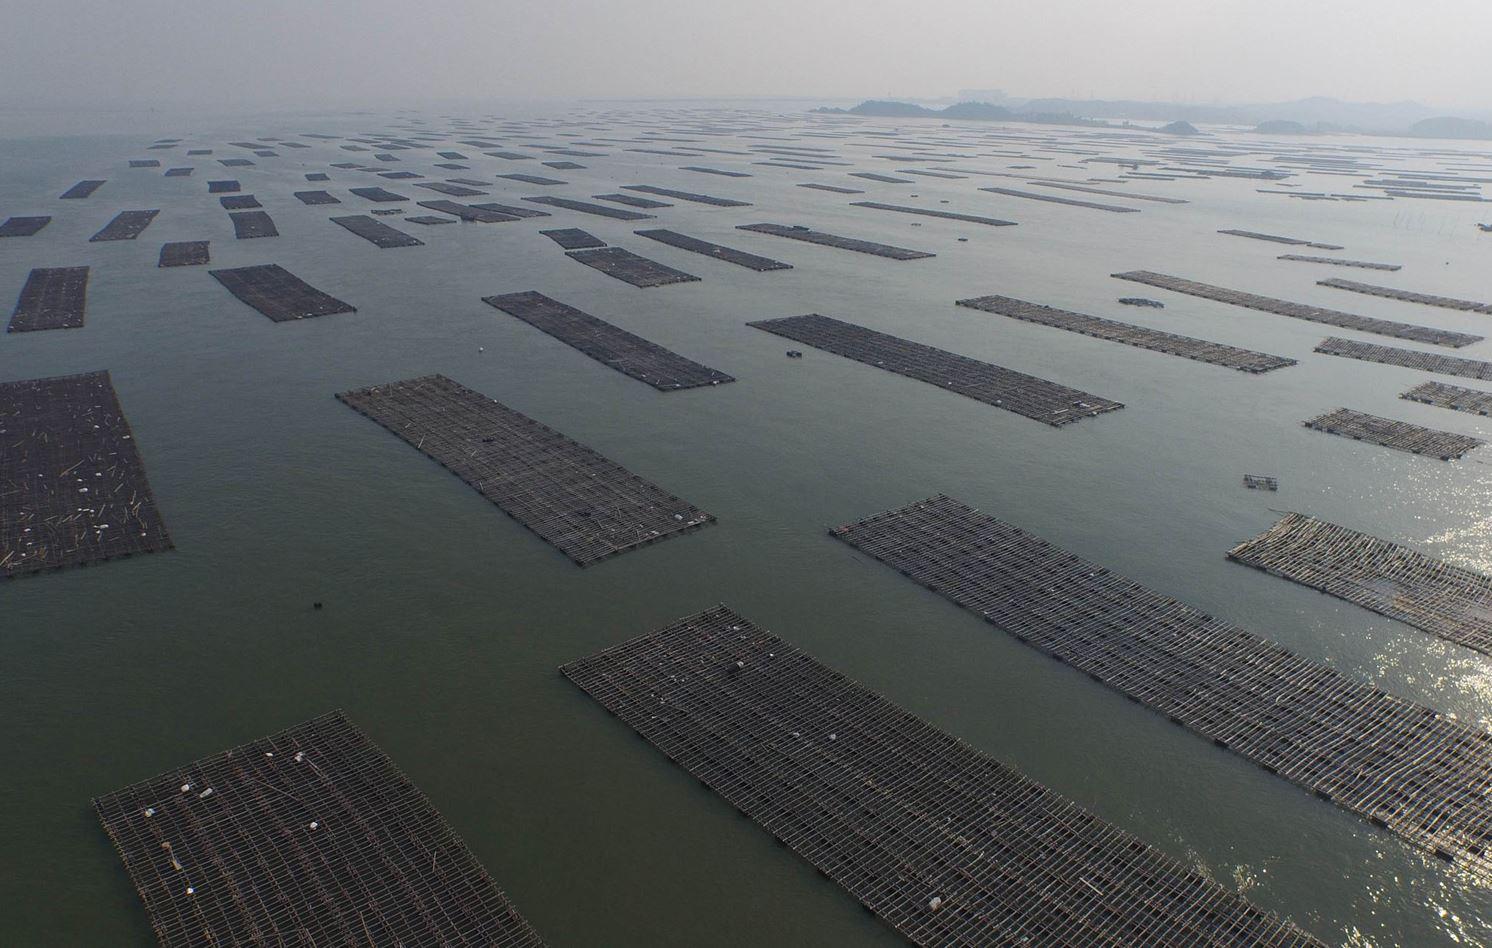 Рыбные фермы в г. о. Циньчжоу, Гуанси-Чжуанском АР.